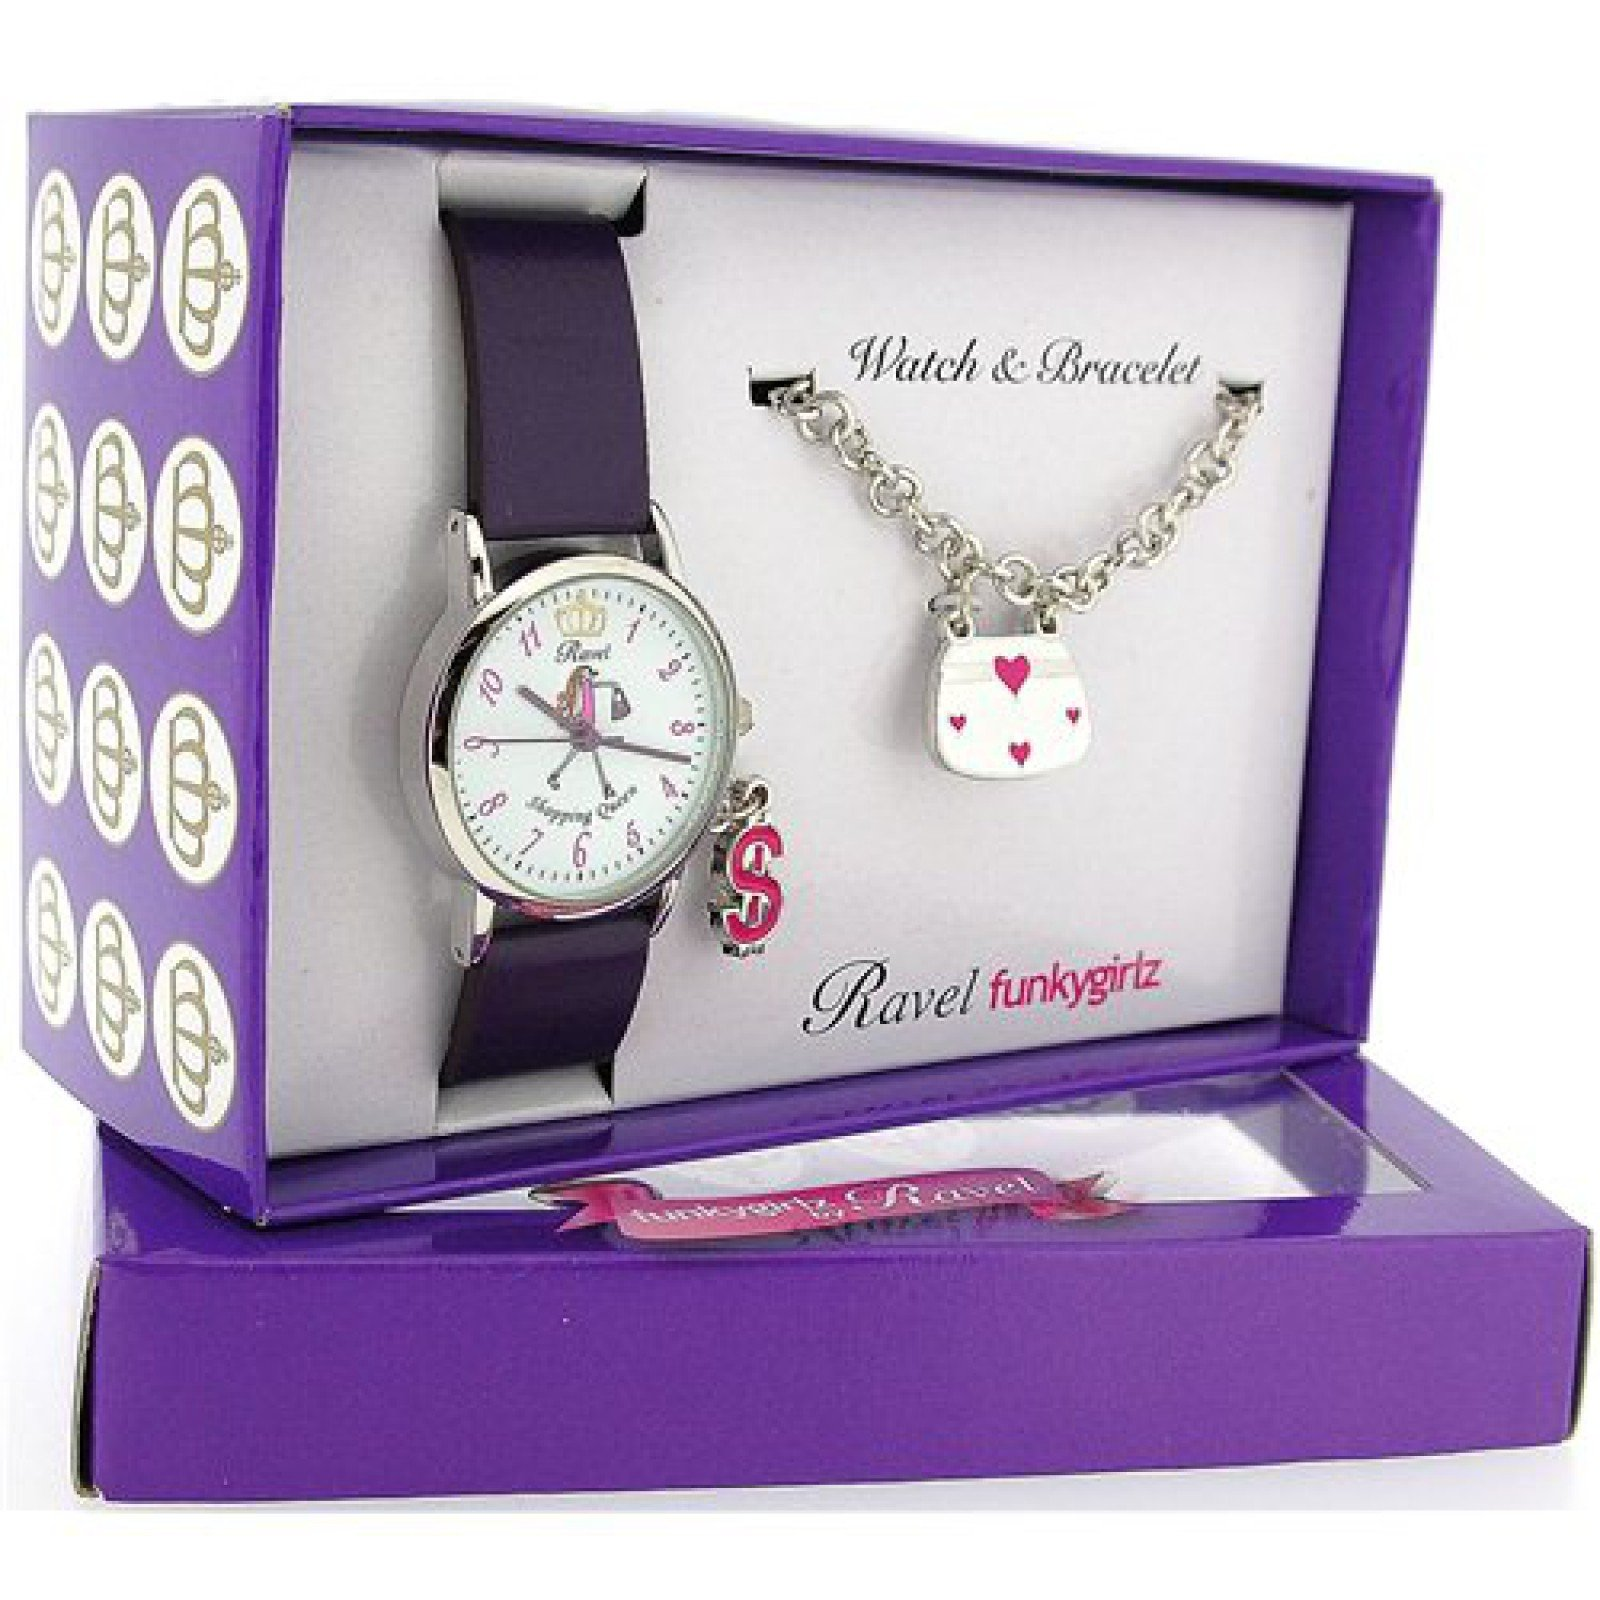 Ravel Girlz Watch and Jewellery Girls Gift set Shopping Queen R3302